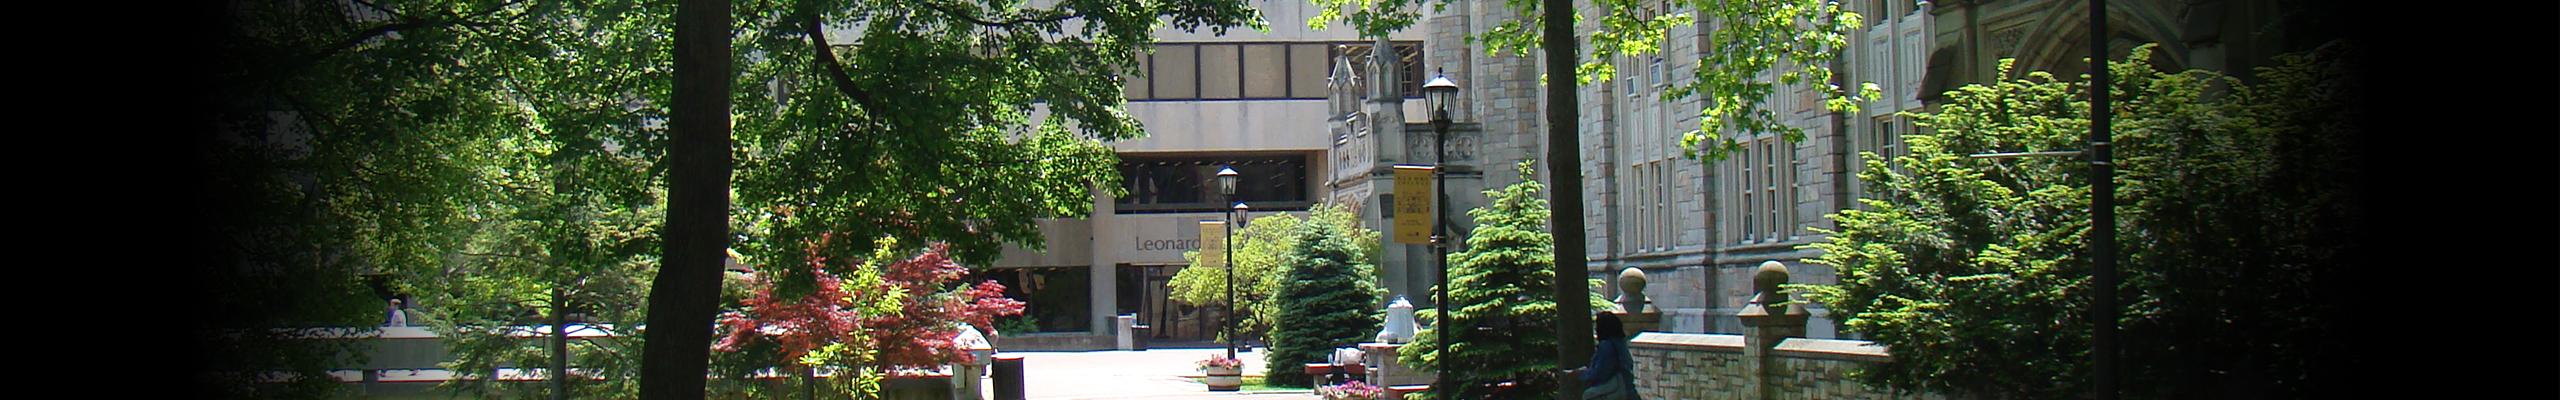 Office of the Registrar  DegreeWorks  Lehman College